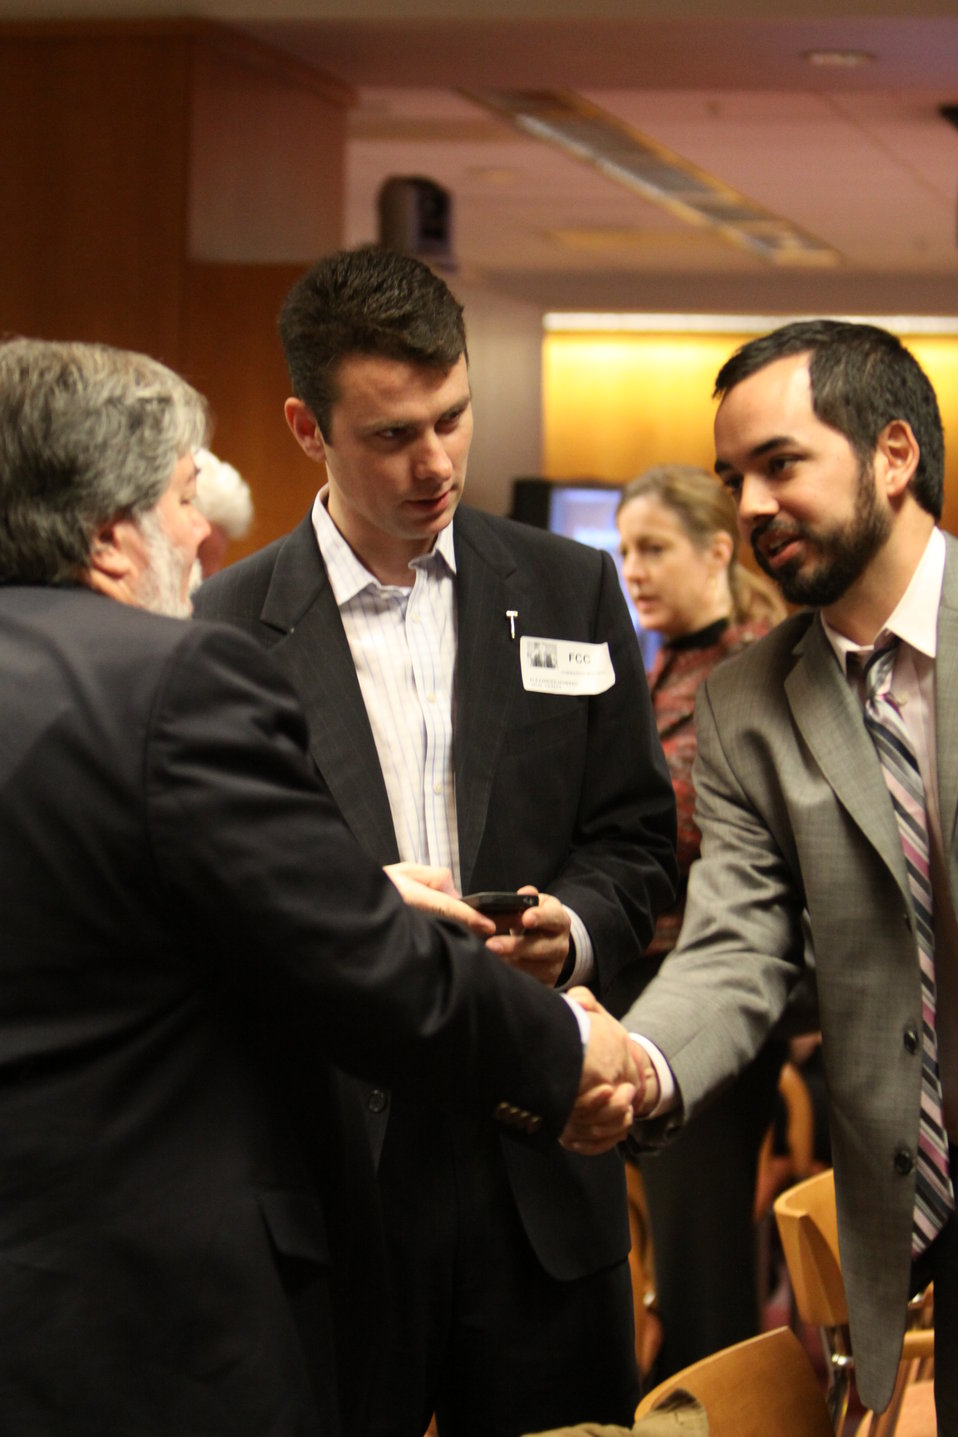 Dan McSwain, FCC New Media with Apple Co-Founder Steve Wozniak and O'Reilly Media Correspondent Alex Howard